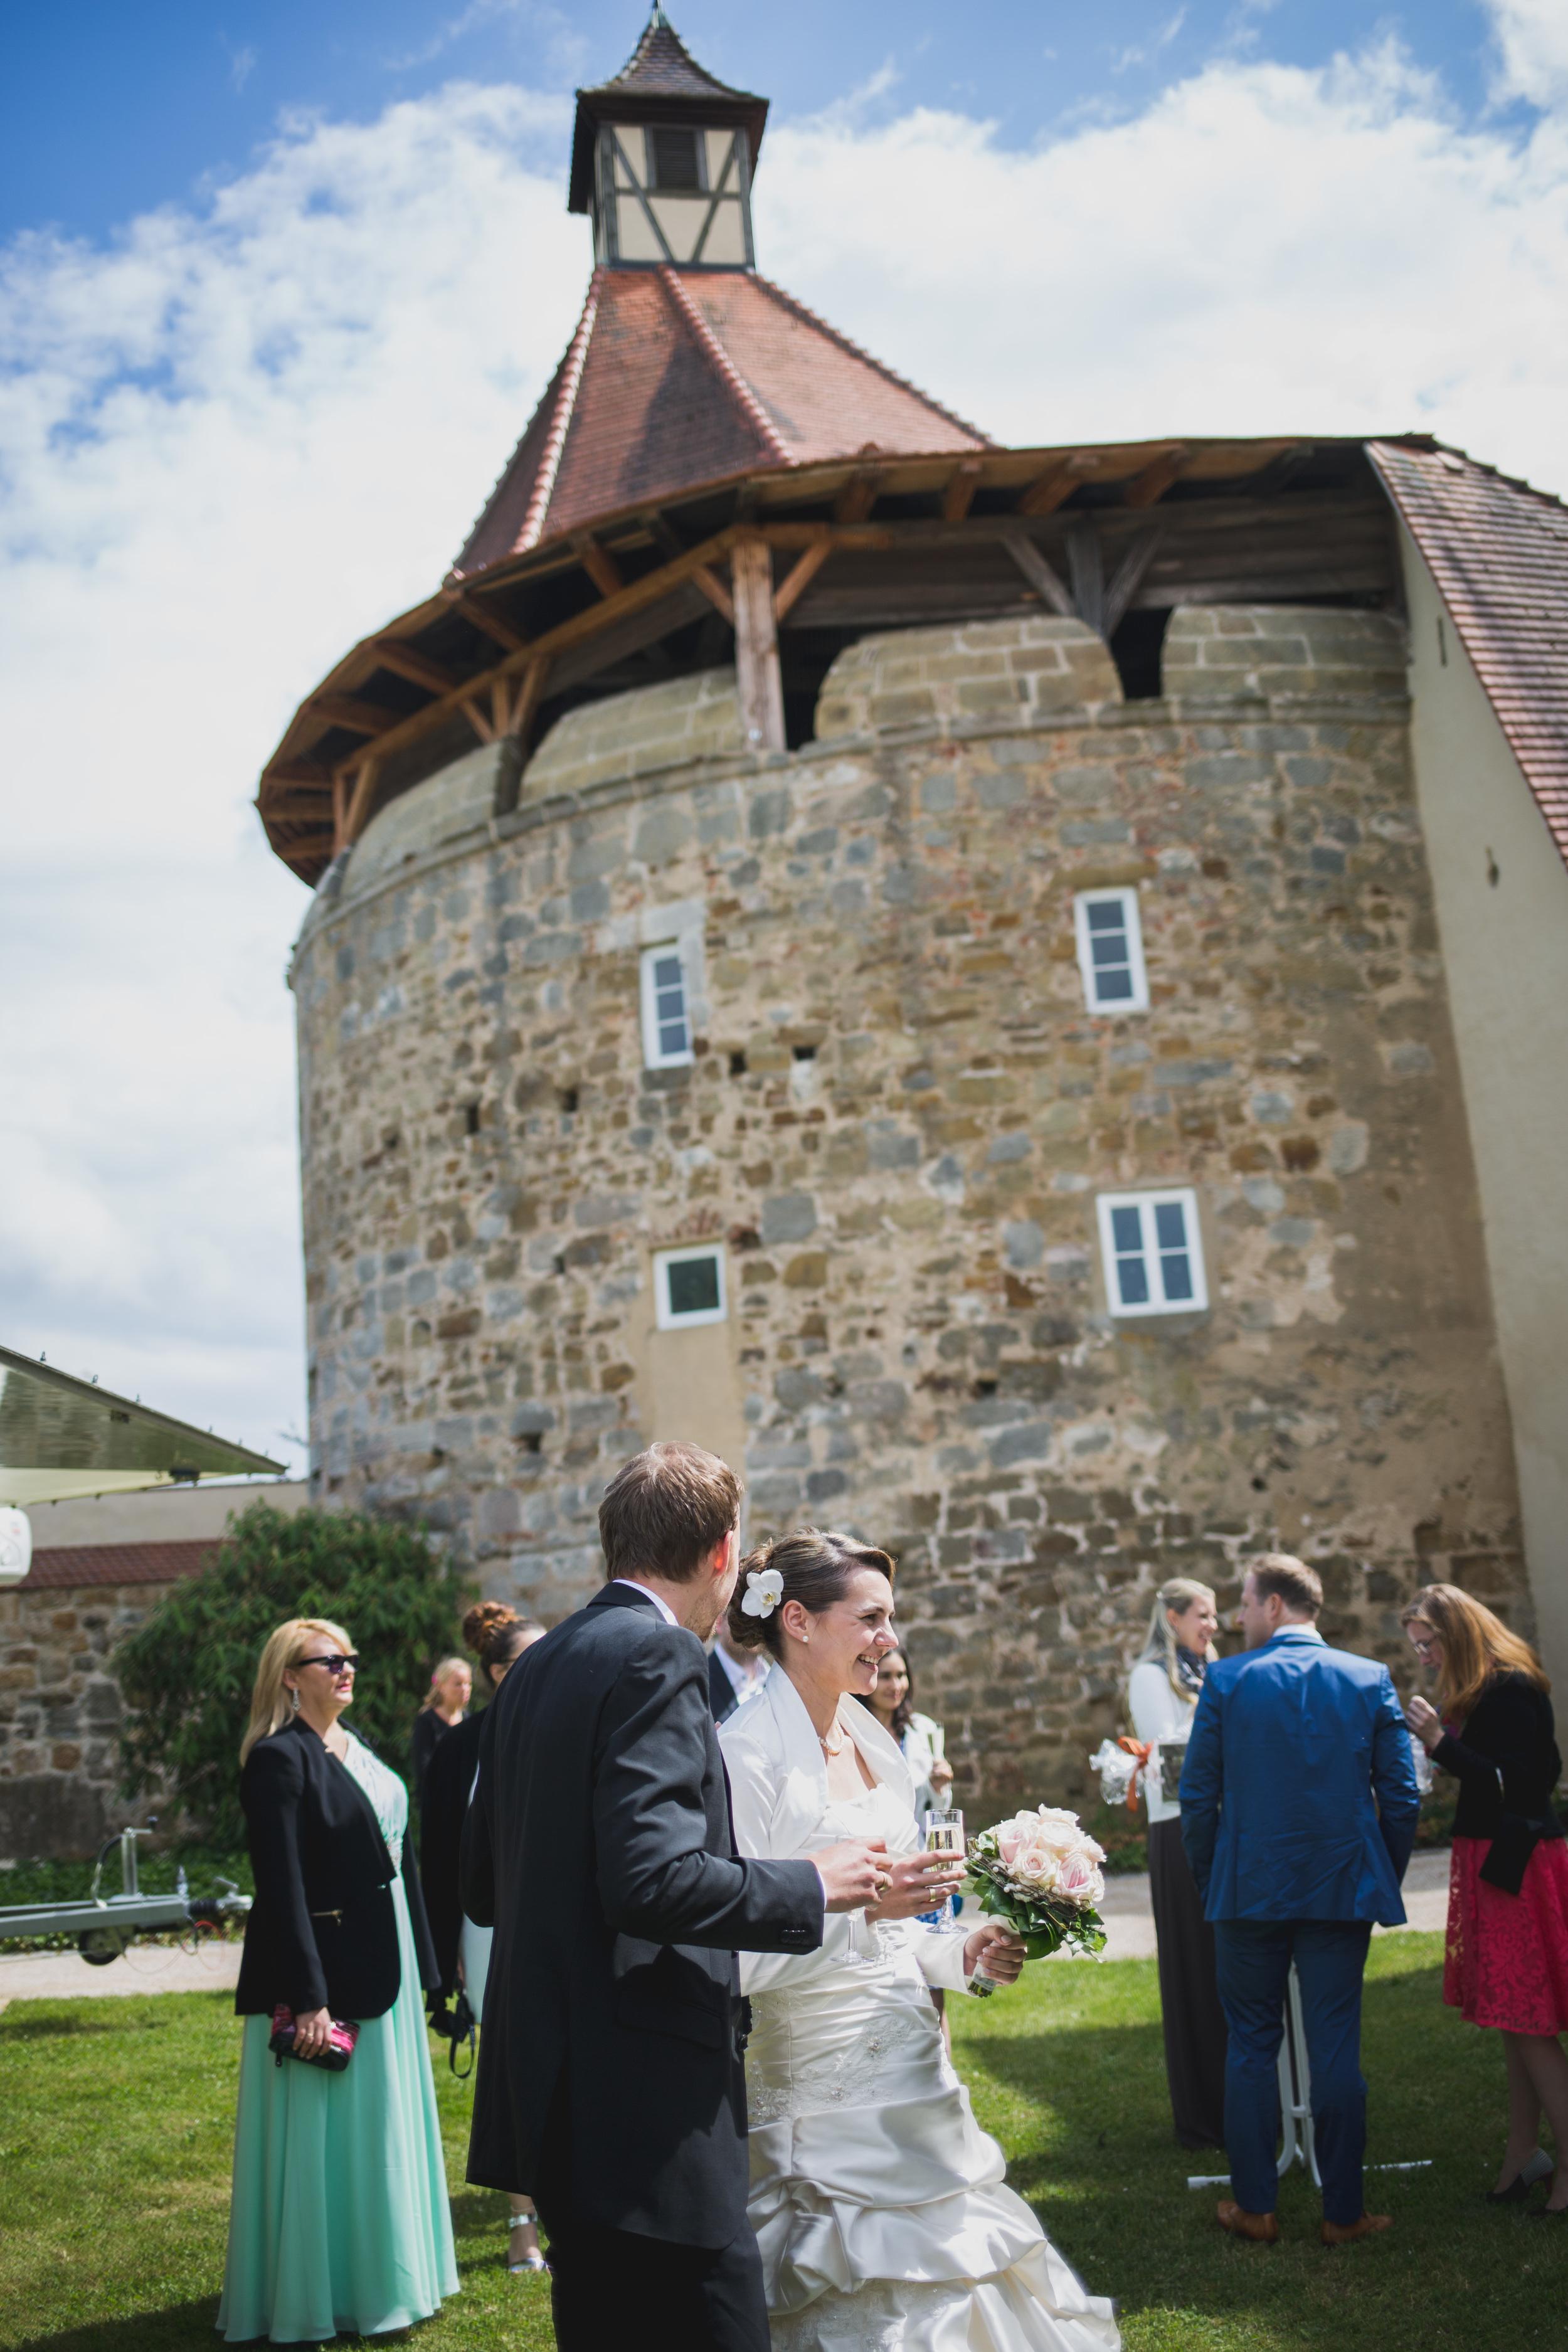 Pauline-Und-Christoph-Buffalo-NY-Wedding-by-Stefan-Ludwig-Photography-388.jpg